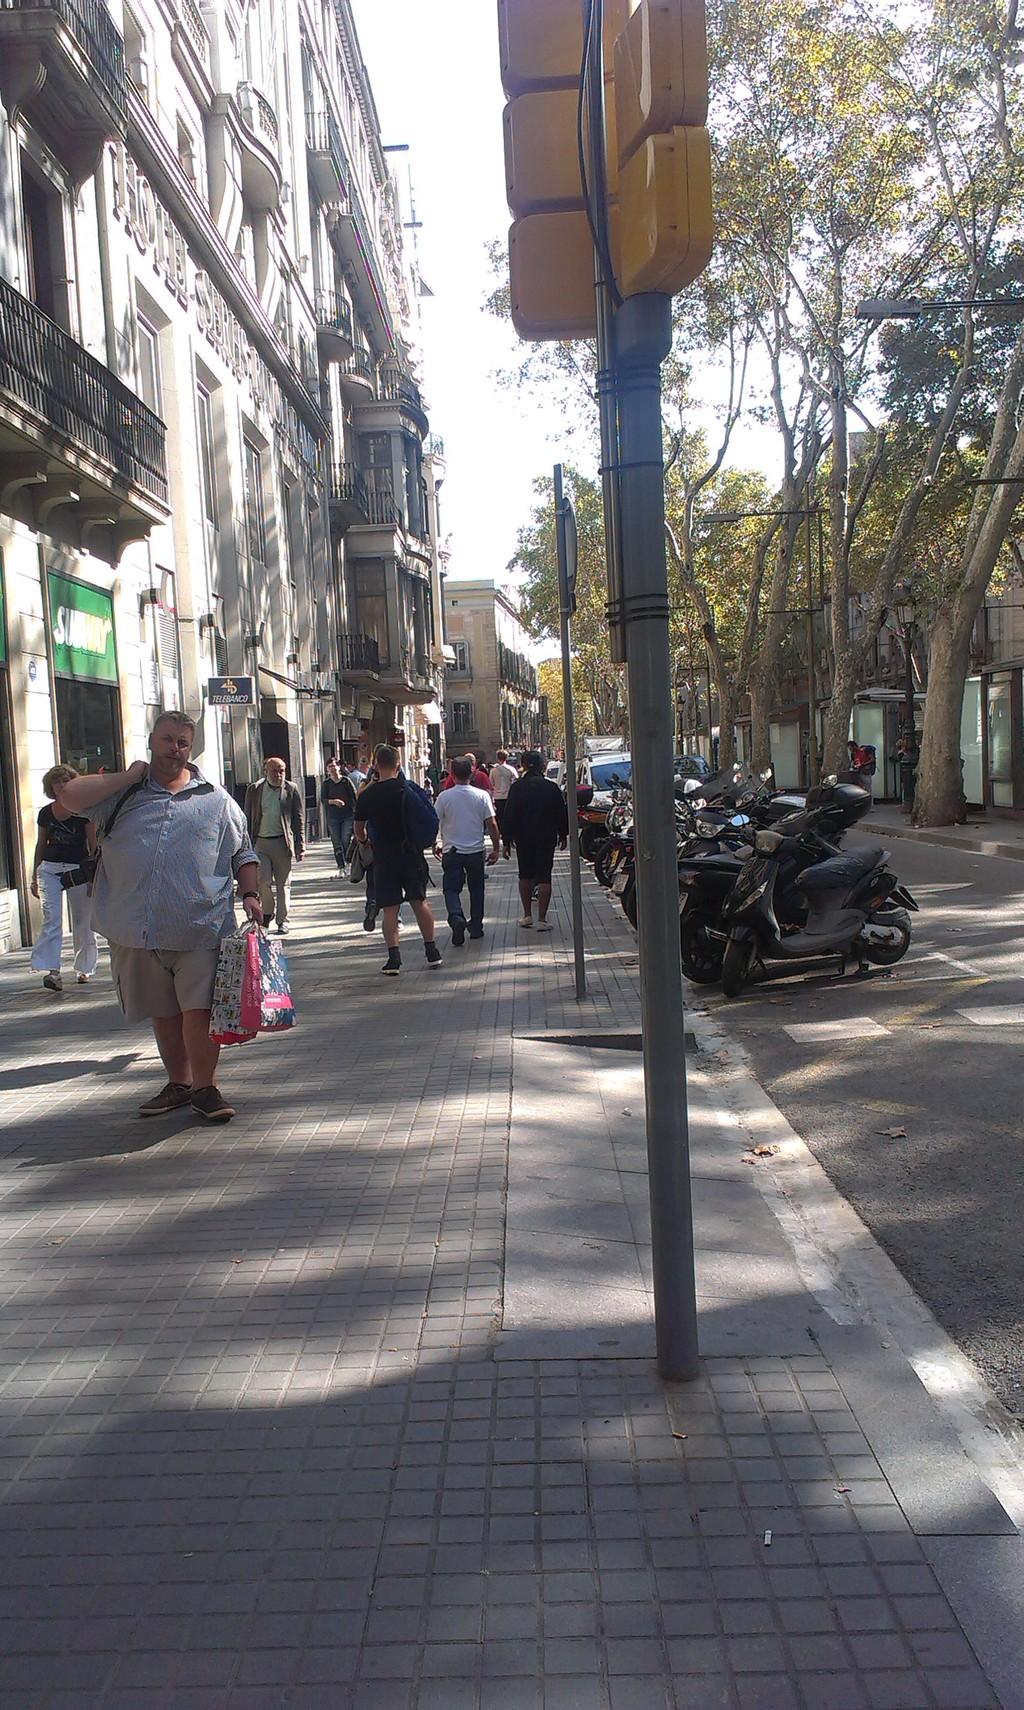 a-street-barcelona-1dbe40faaa03fe37c8b13